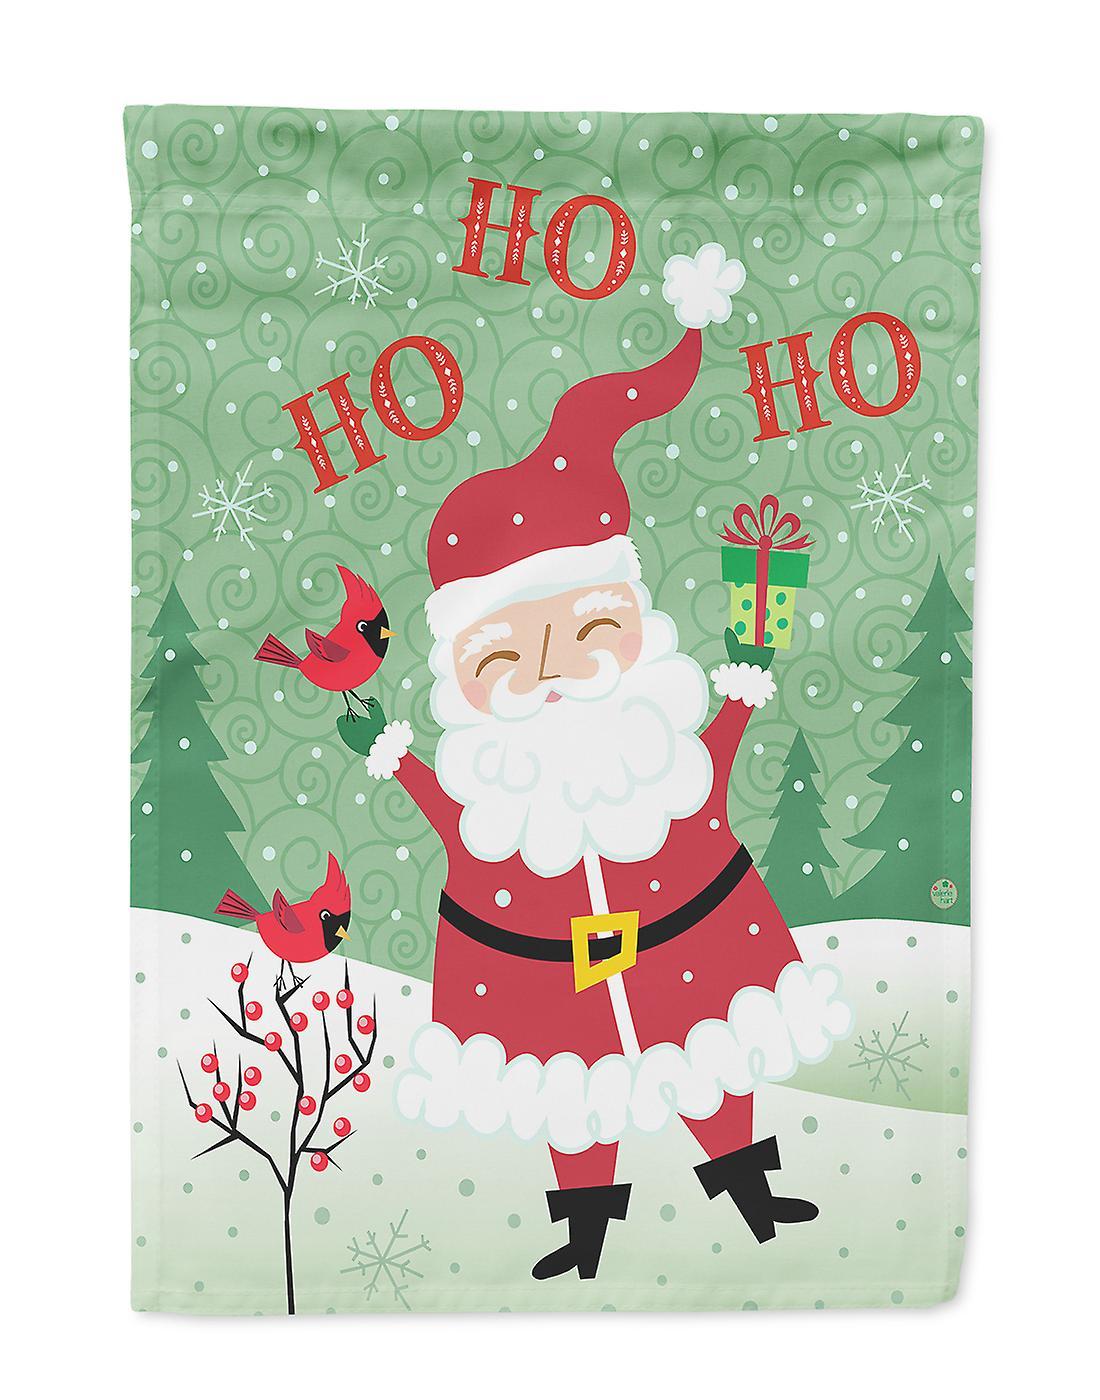 Ho Ho Ho Frohe Weihnachten.Frohe Weihnachten Santa Claus Ho Ho Ho Flagge Garten Grosse